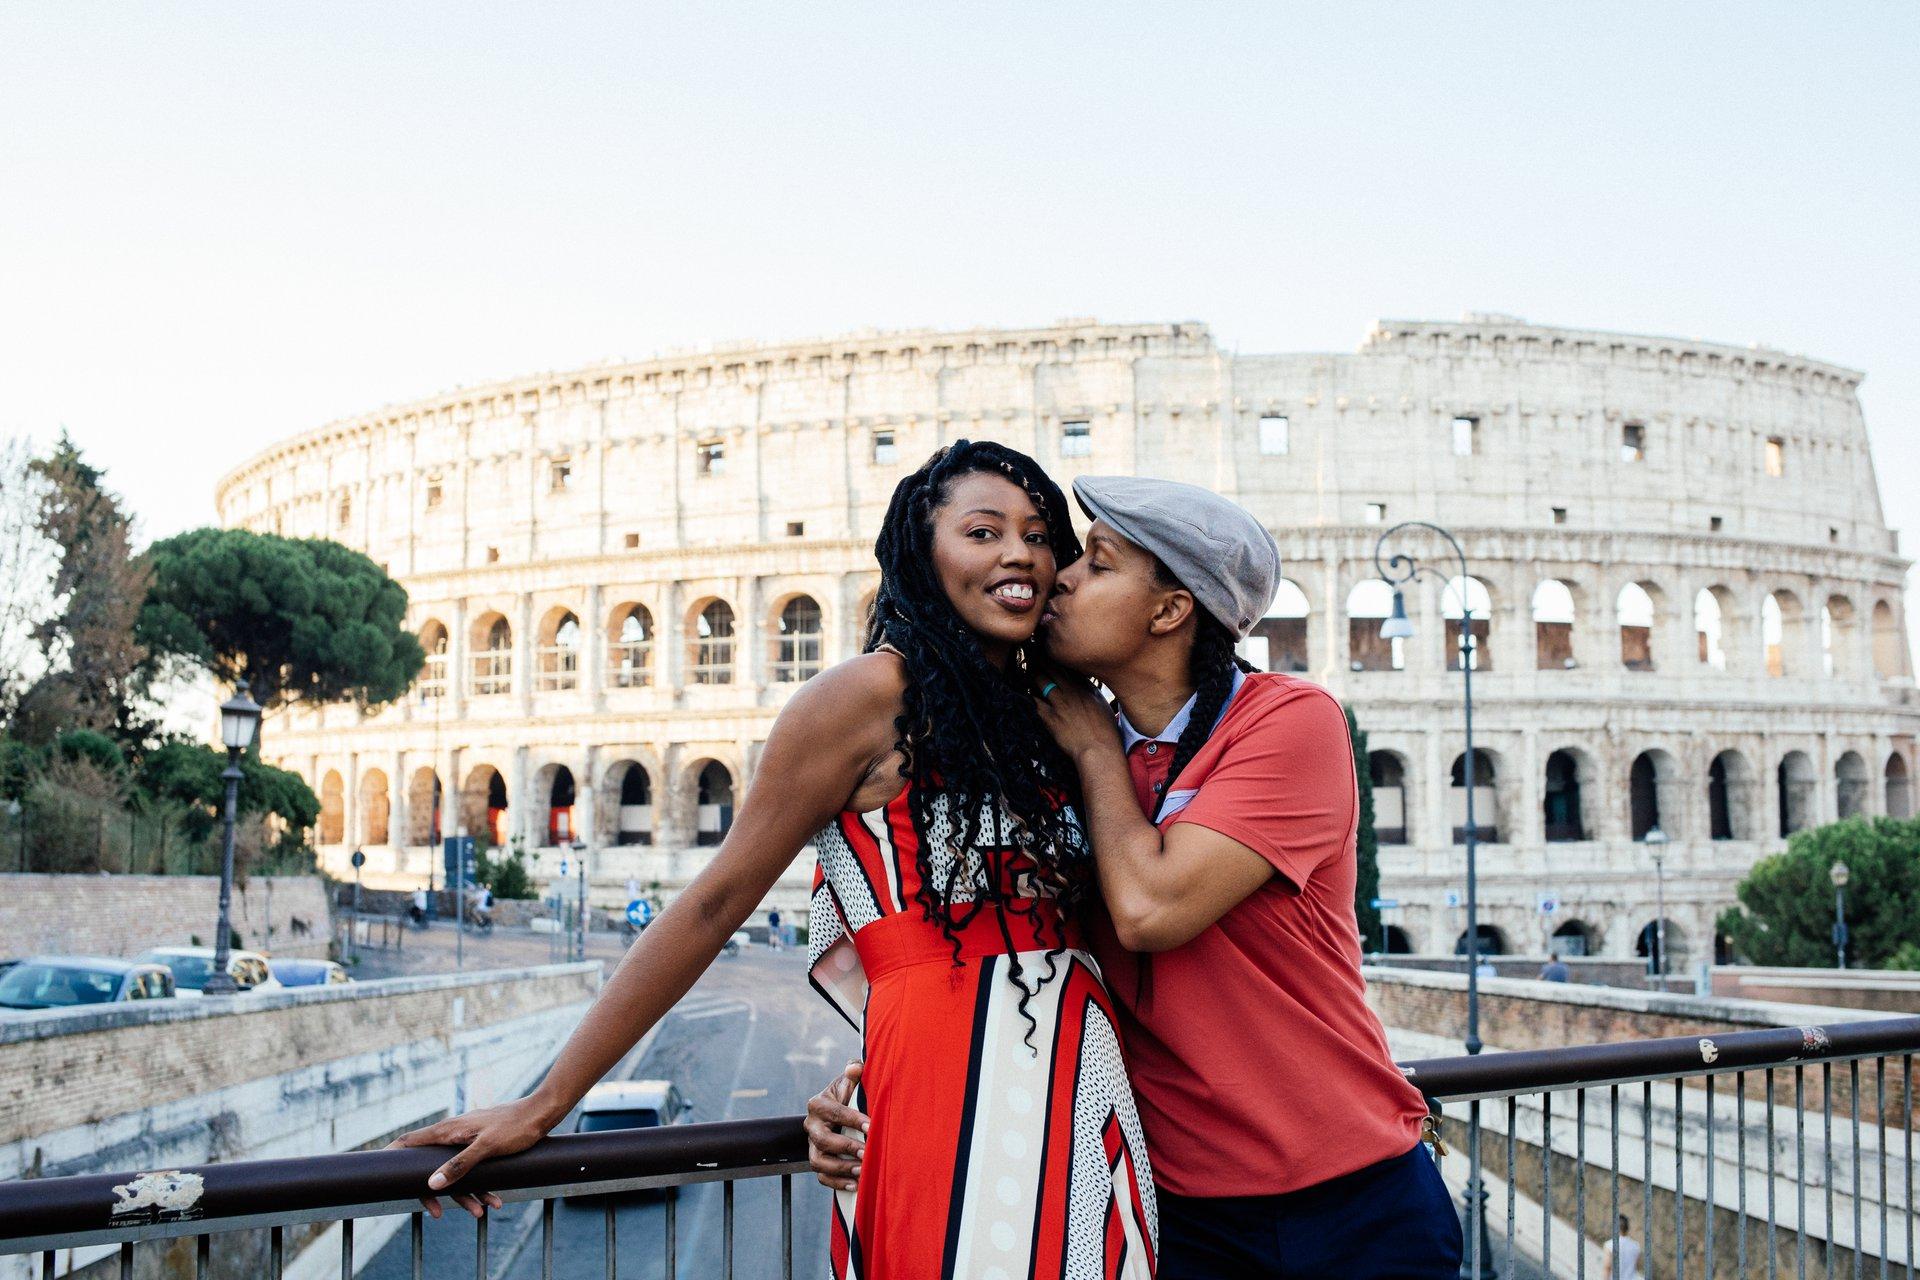 Rome-Italy-travel-story-Flytographer-31